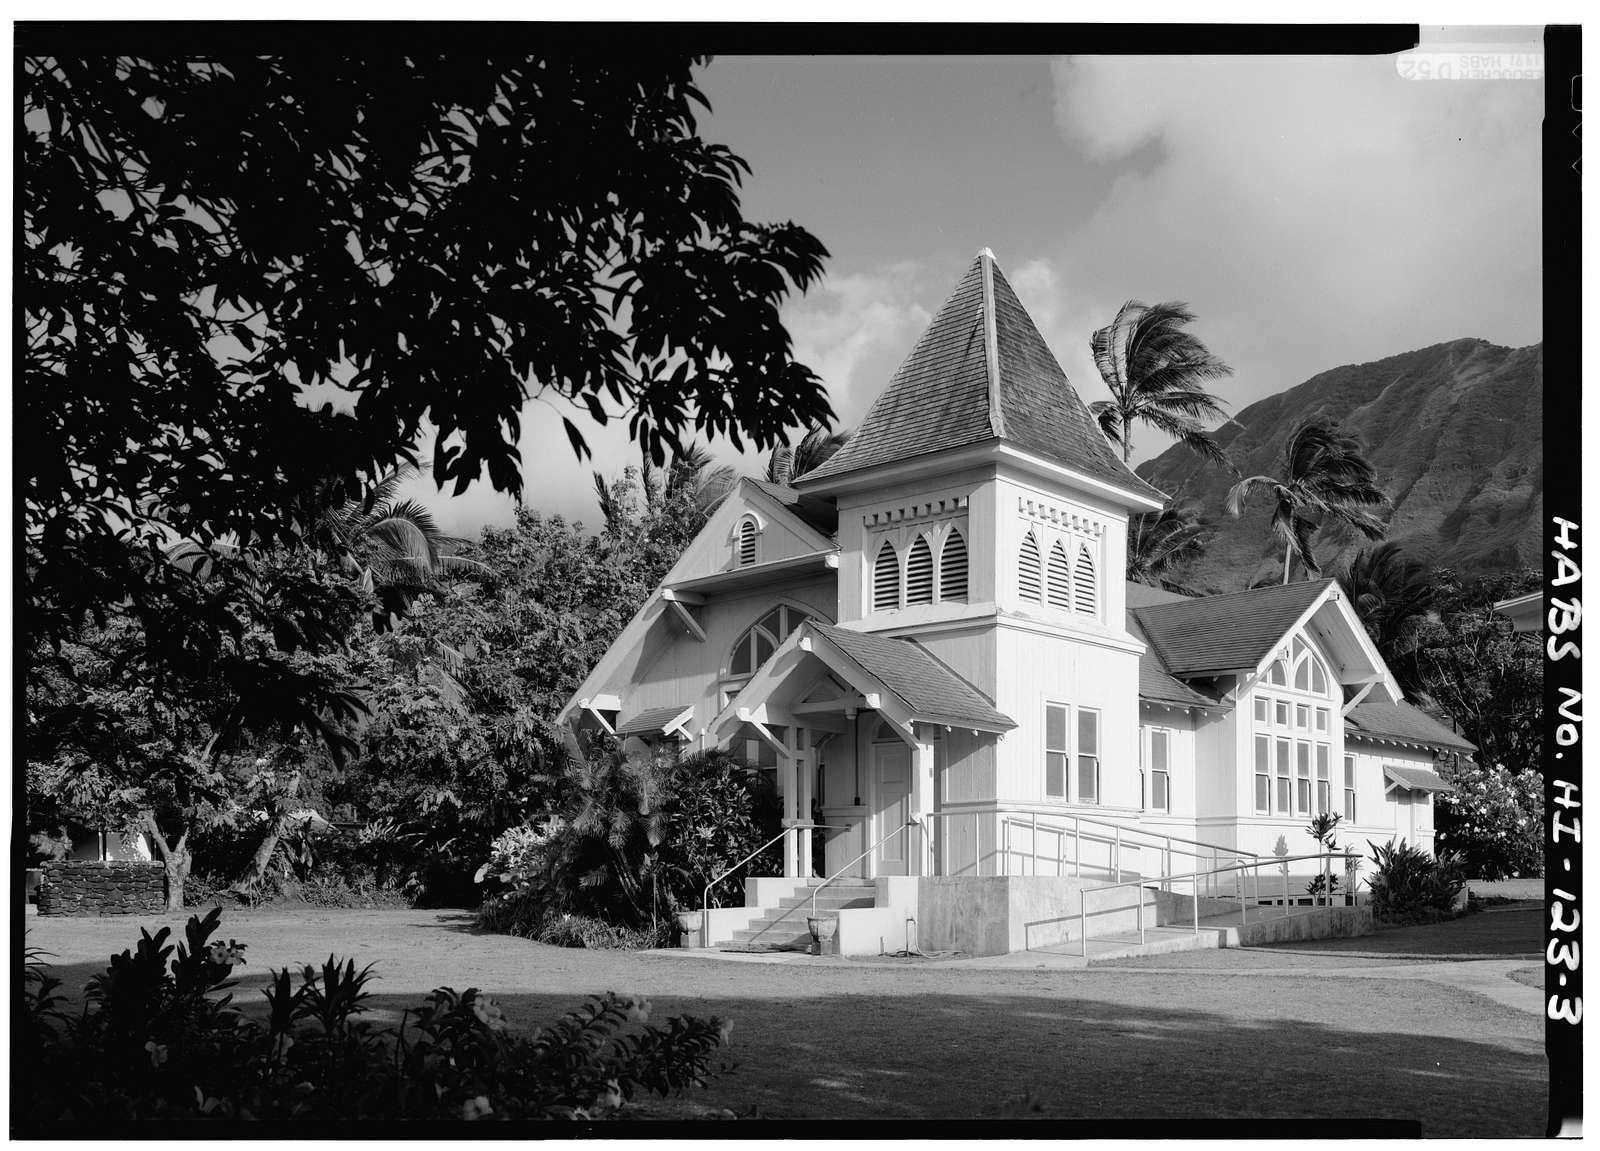 Kanaana Hou Calvinist Church, Moloka'i Island, Kalaupapa, Kalawao County, HI